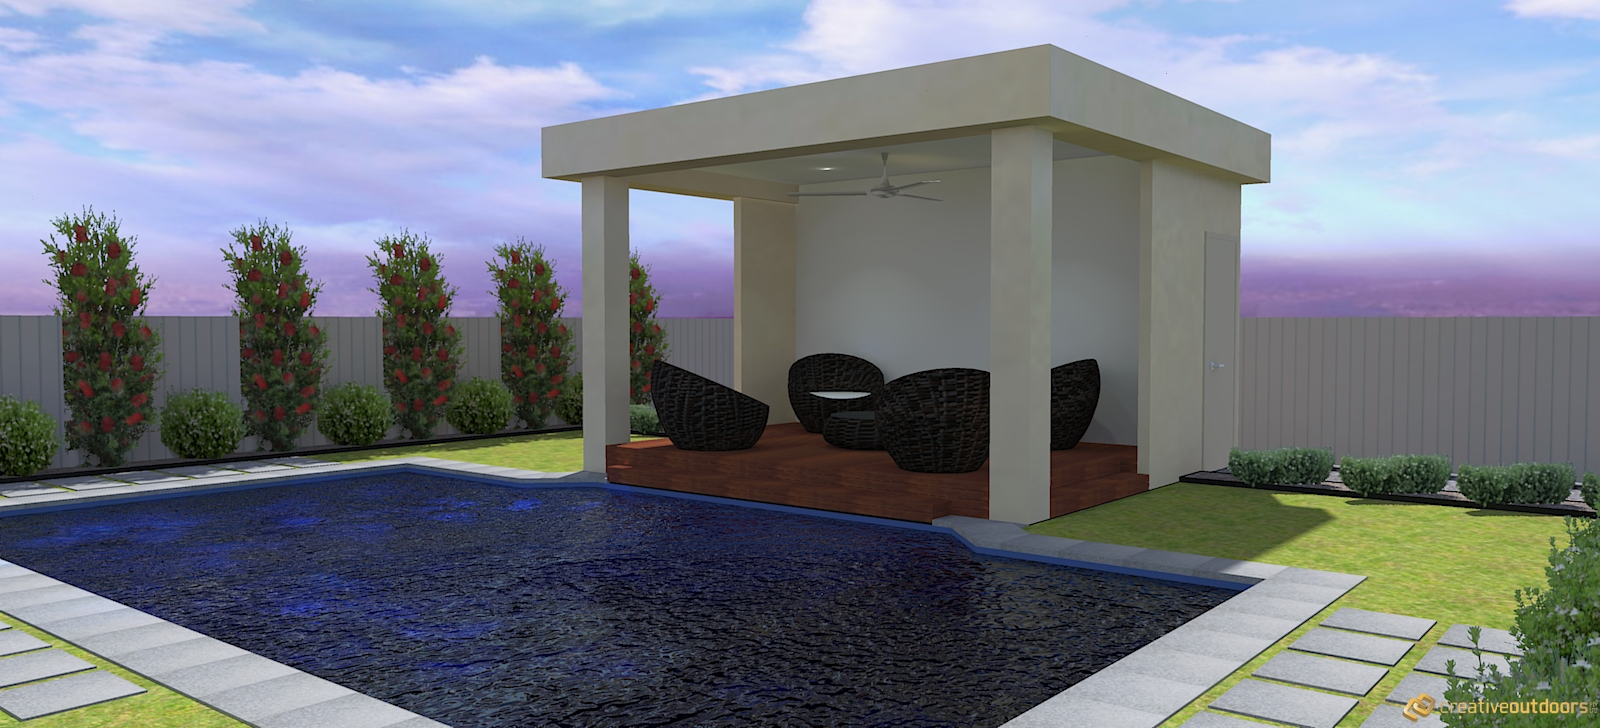 Creative-Outdoors-Outdoor-Concept-Custom-Design-008